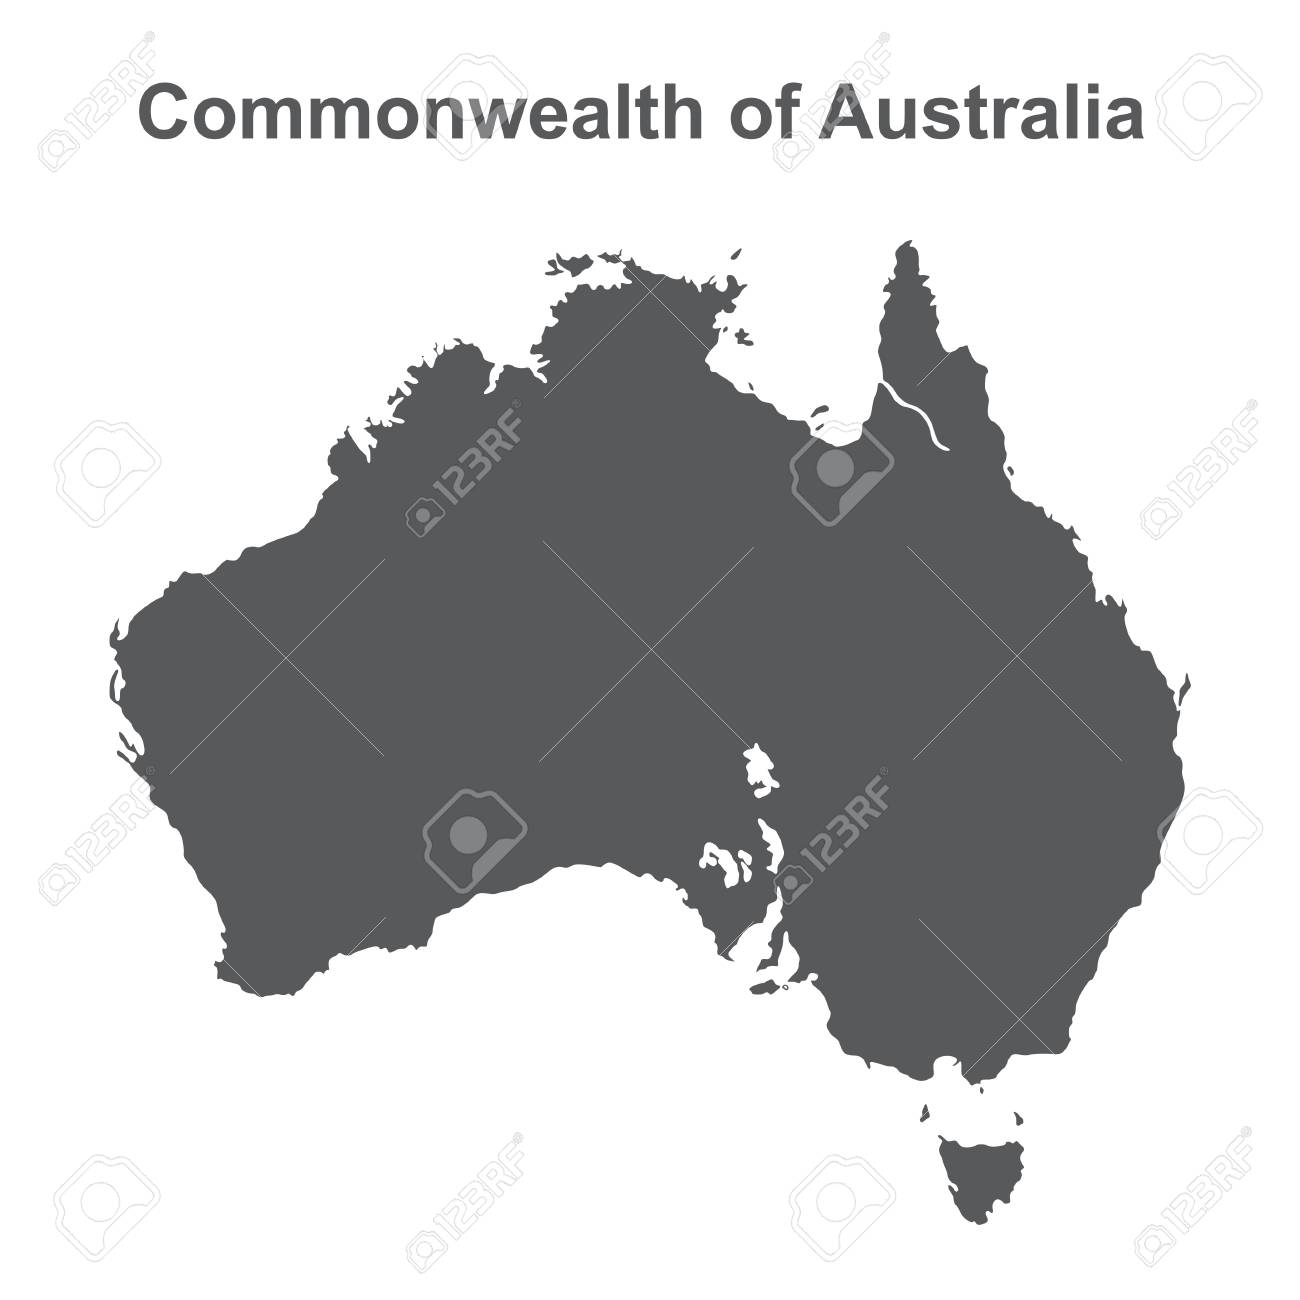 Australia Map Black And White.Stock Illustration